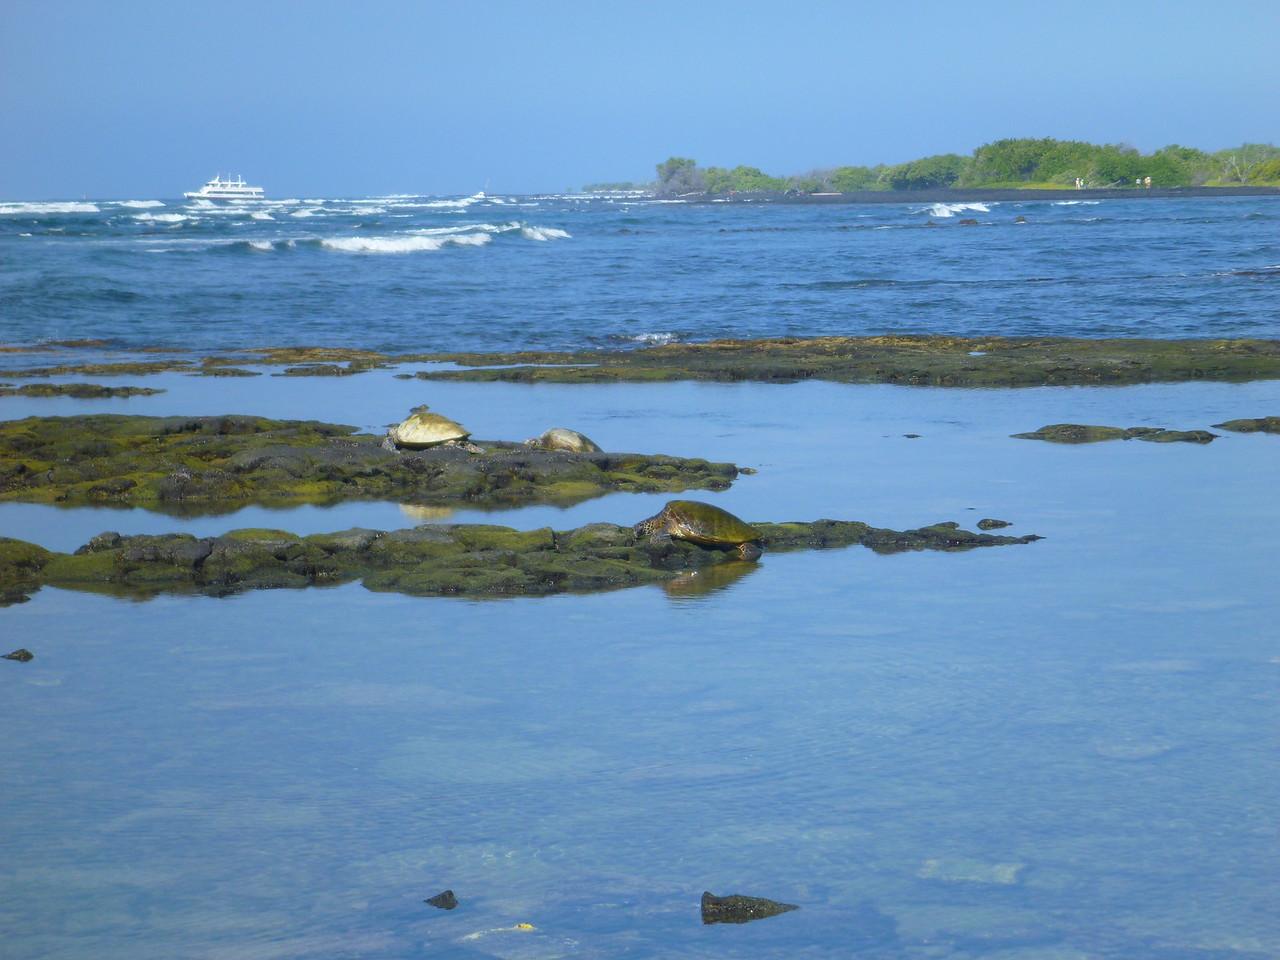 Sea turtles, Kaloko-Honokohau National Historical Park